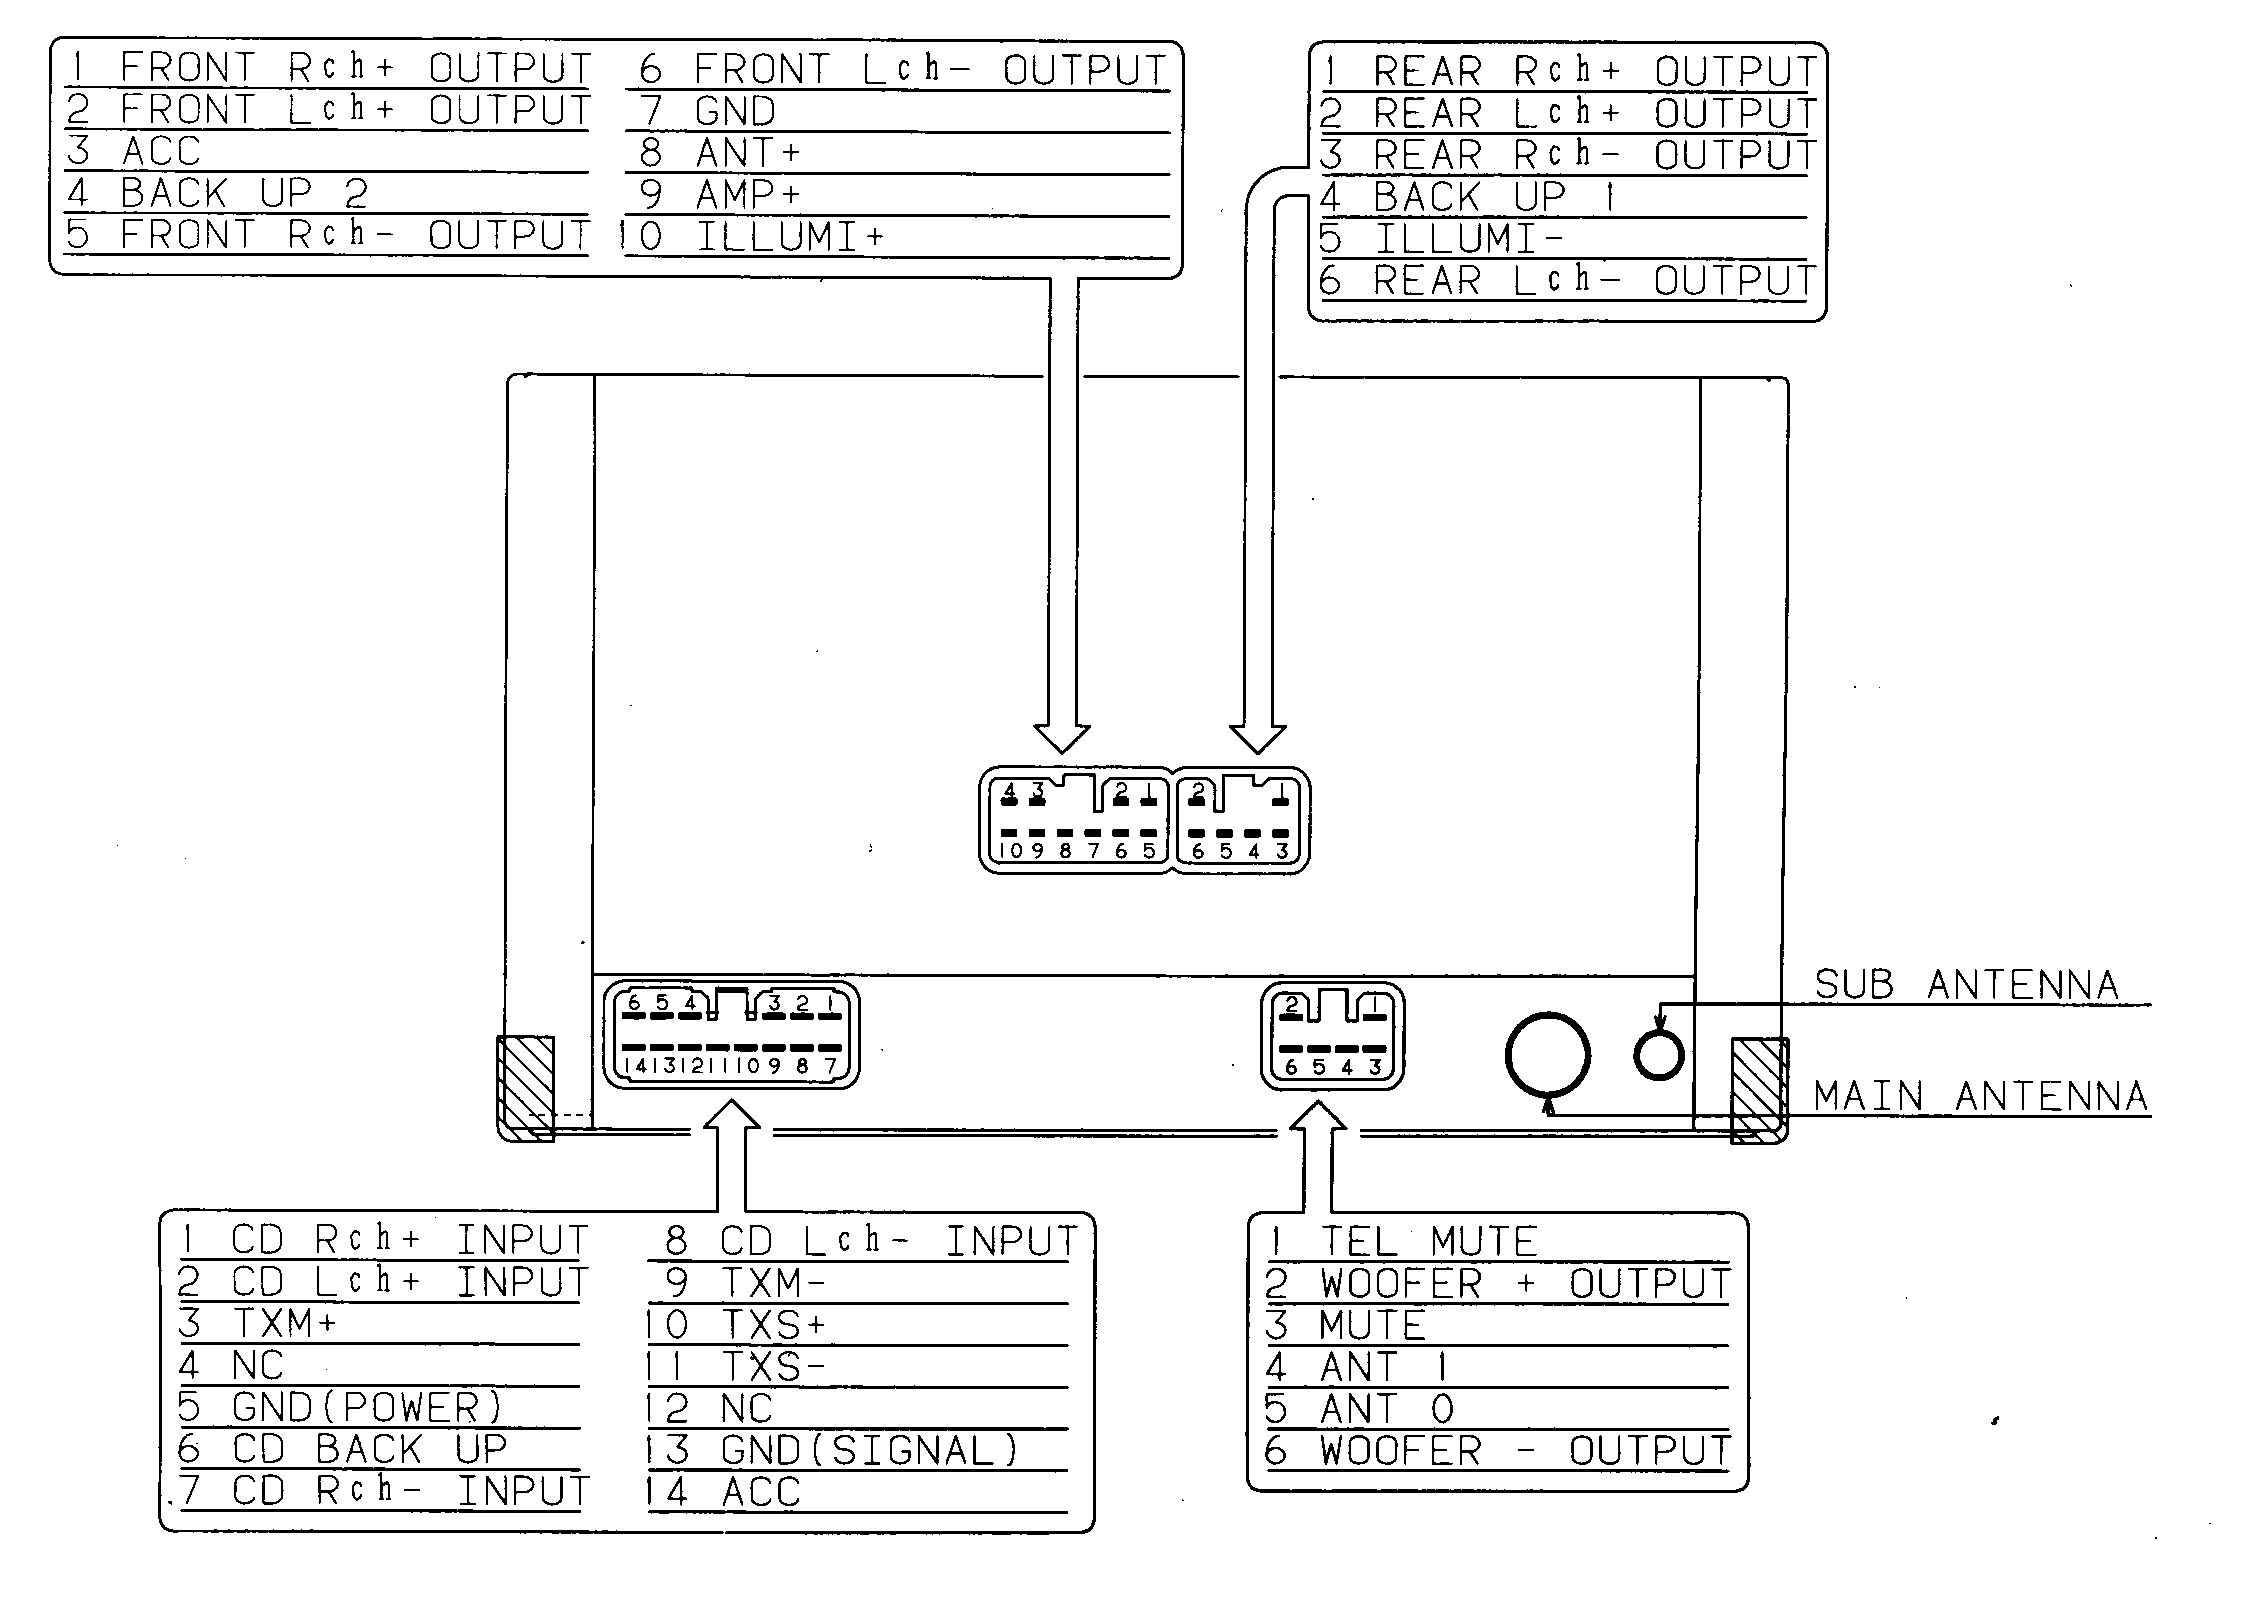 51c8 2005 Gmc Envoy Fuse Box Diagram Wiring Library